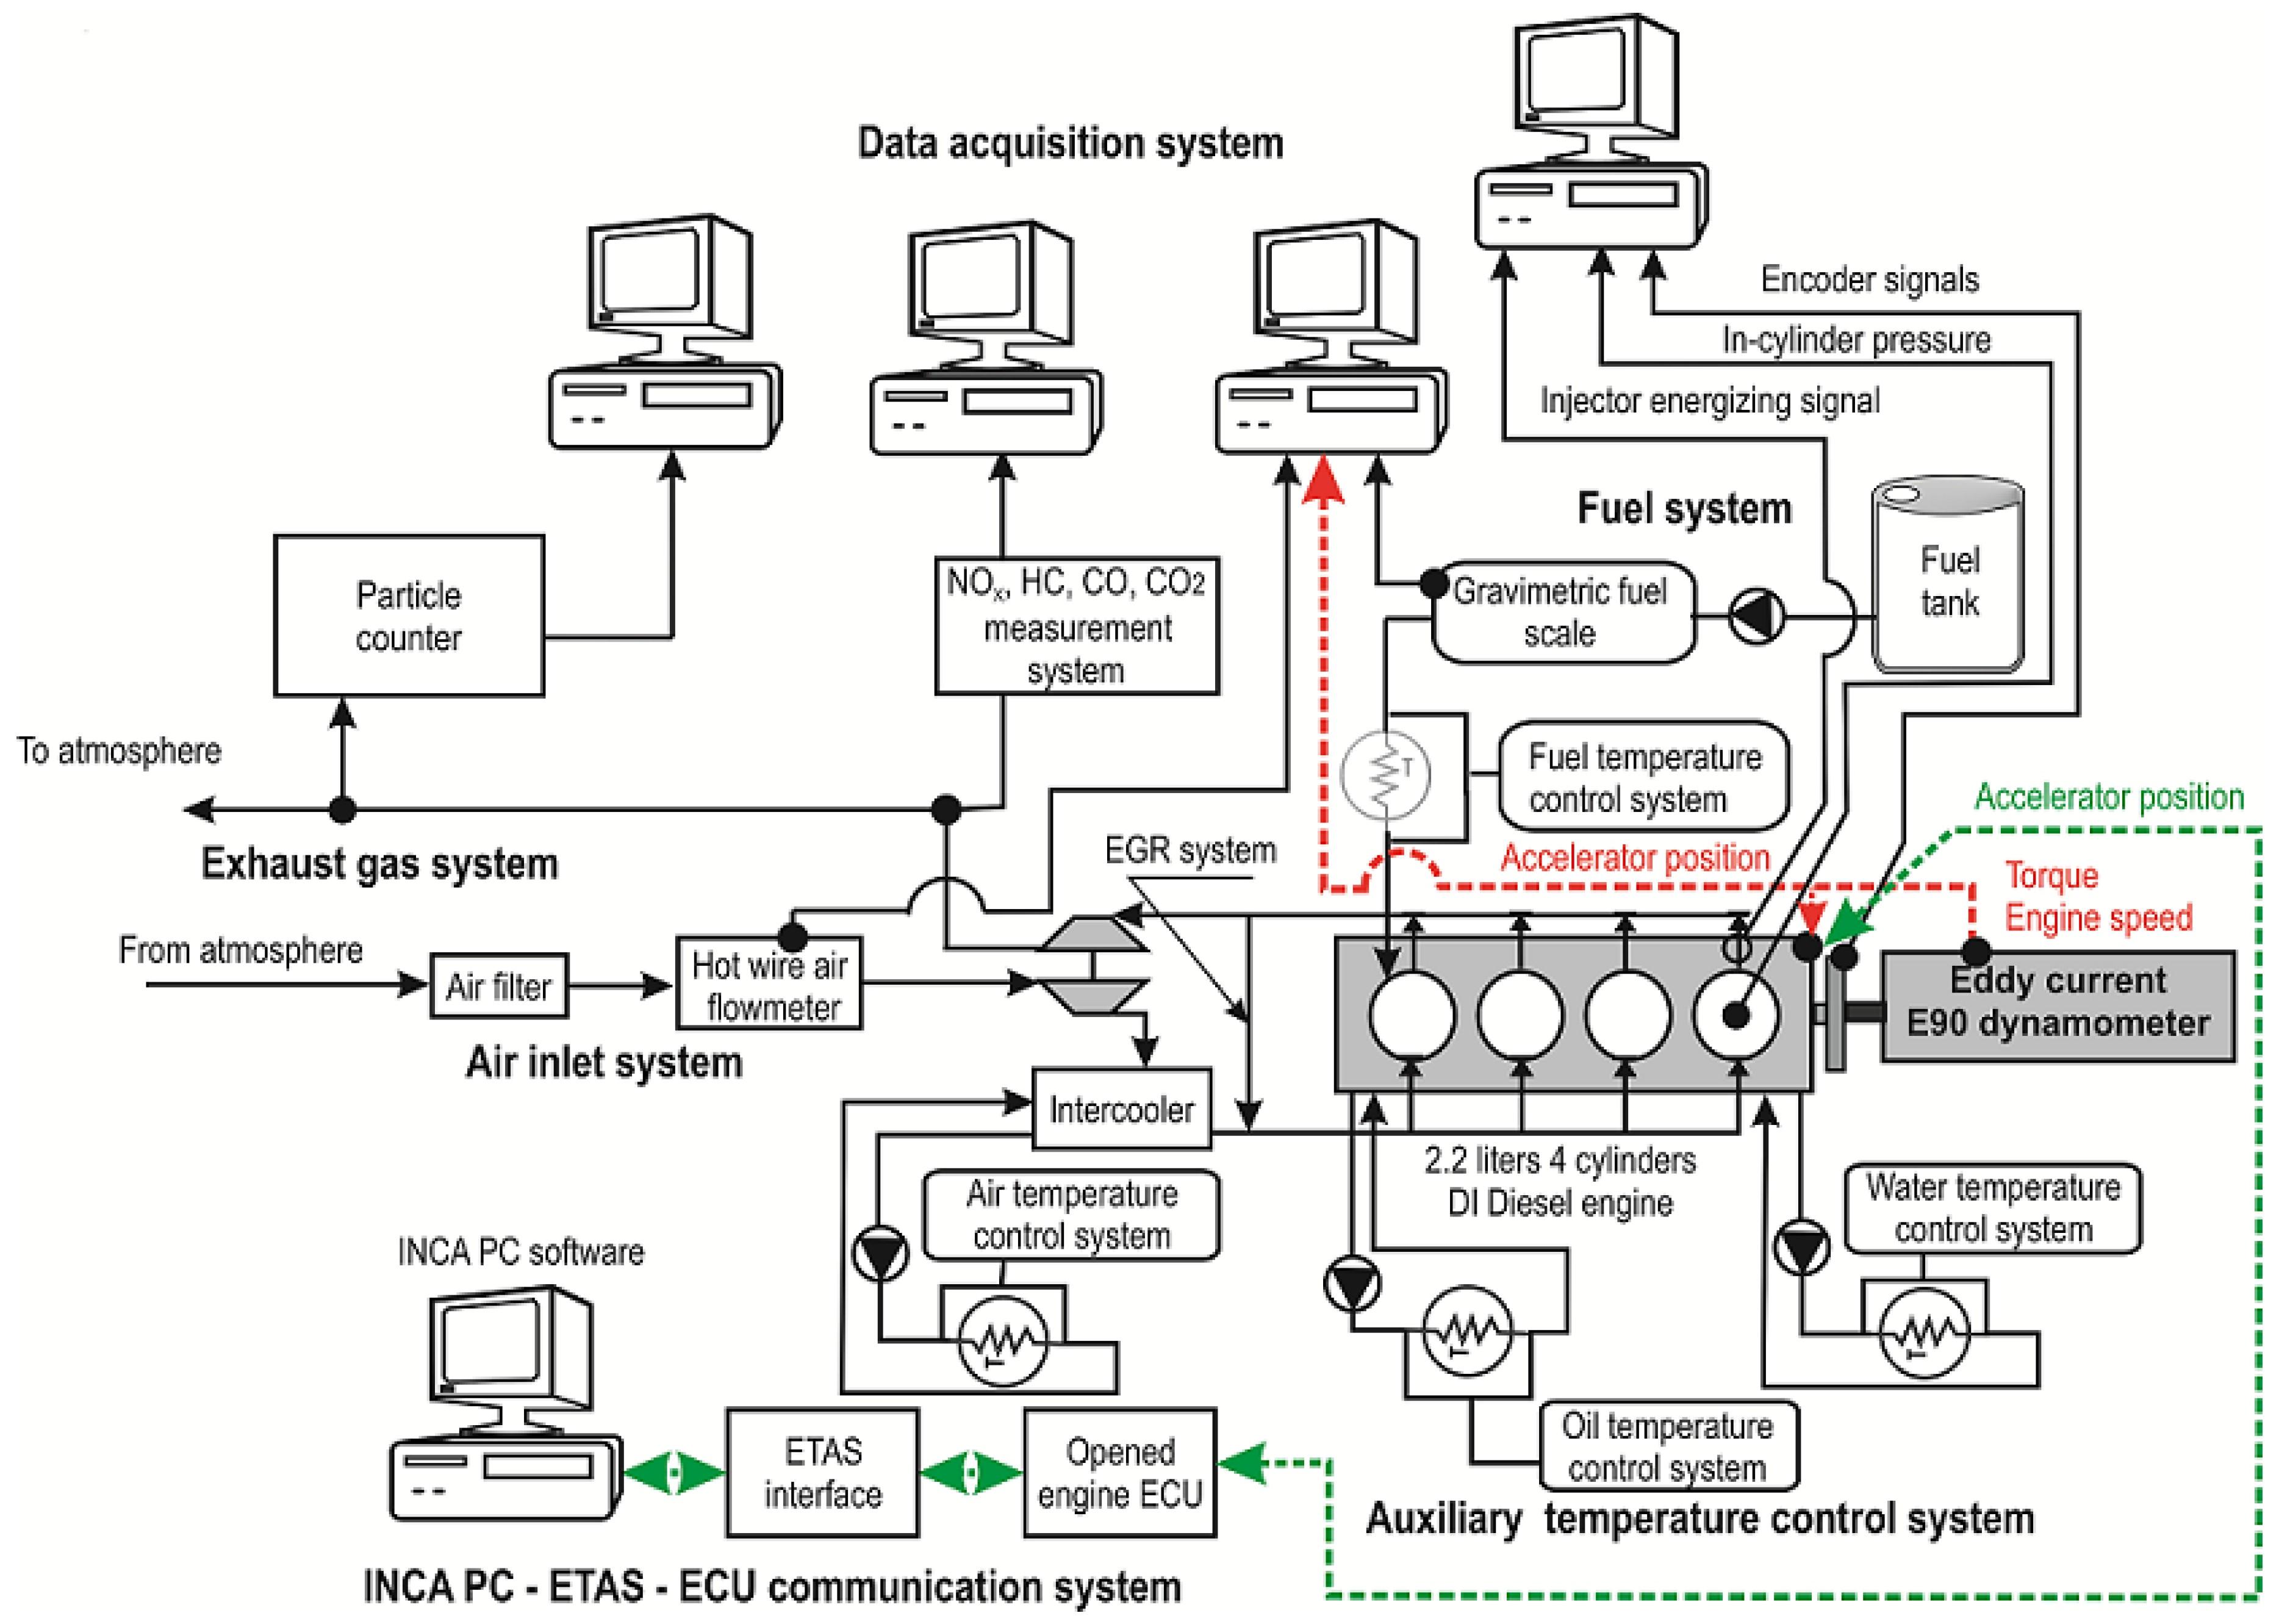 Engine Oiling Diagram Energies Of Engine Oiling Diagram